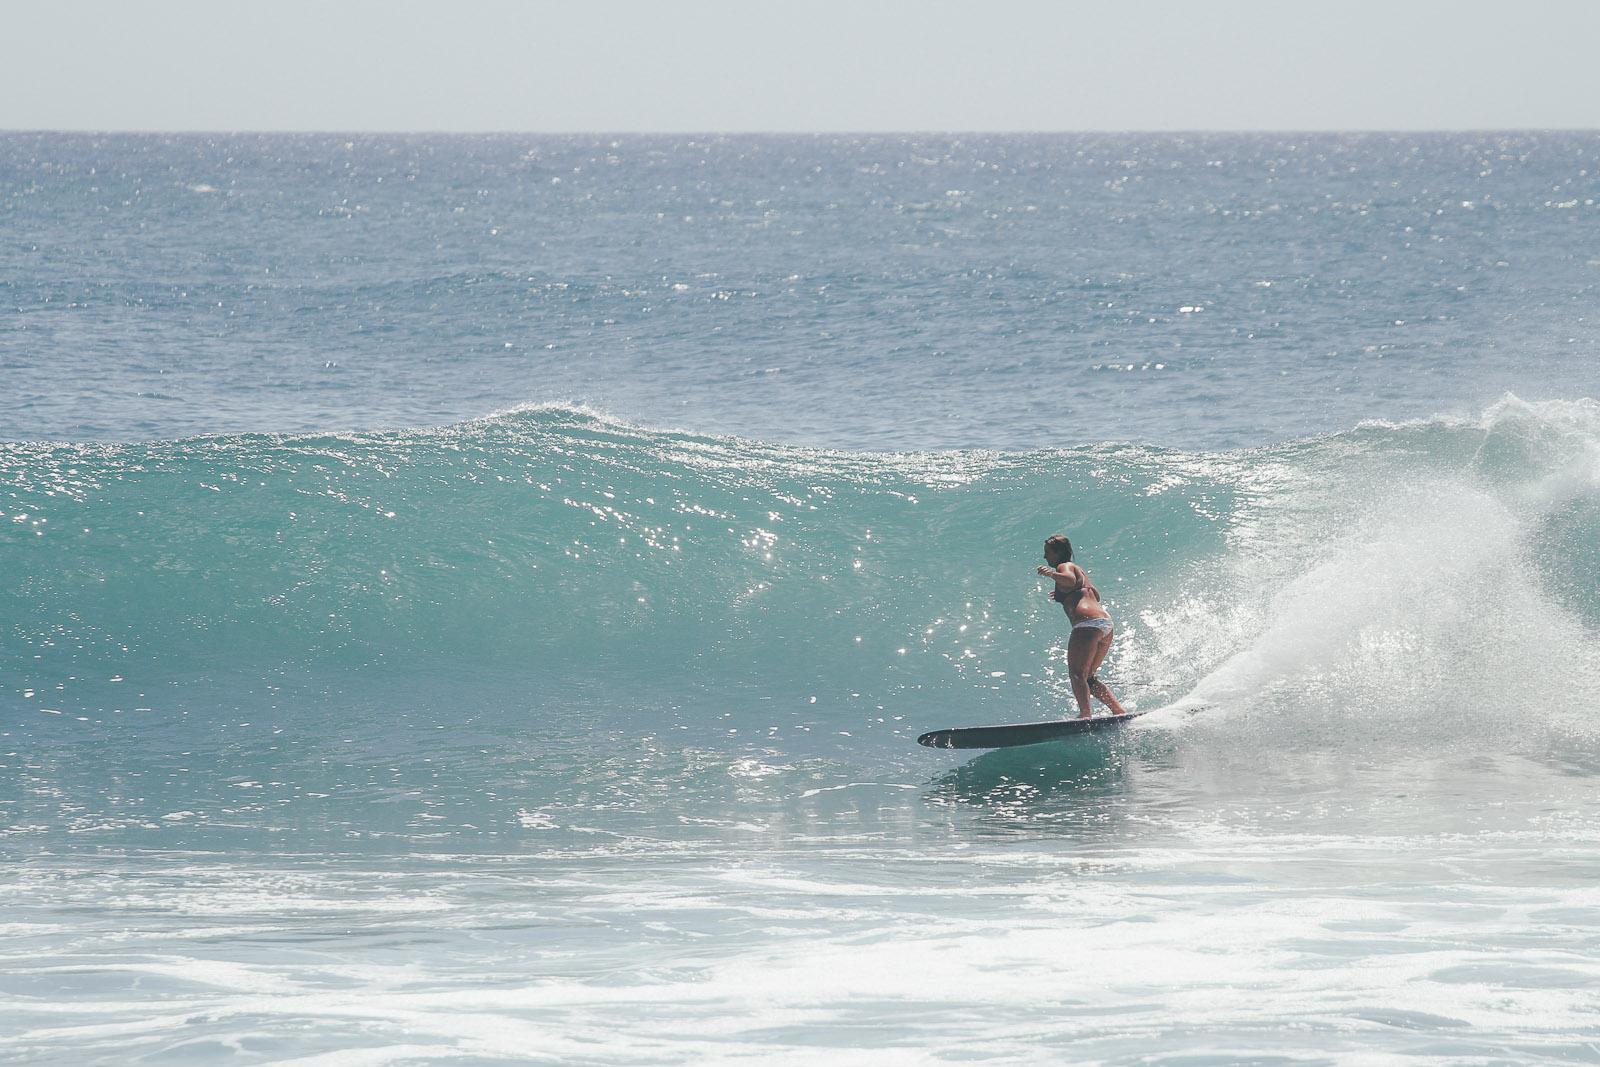 Sunshinestories-surf-travel-blog-IMG_8076